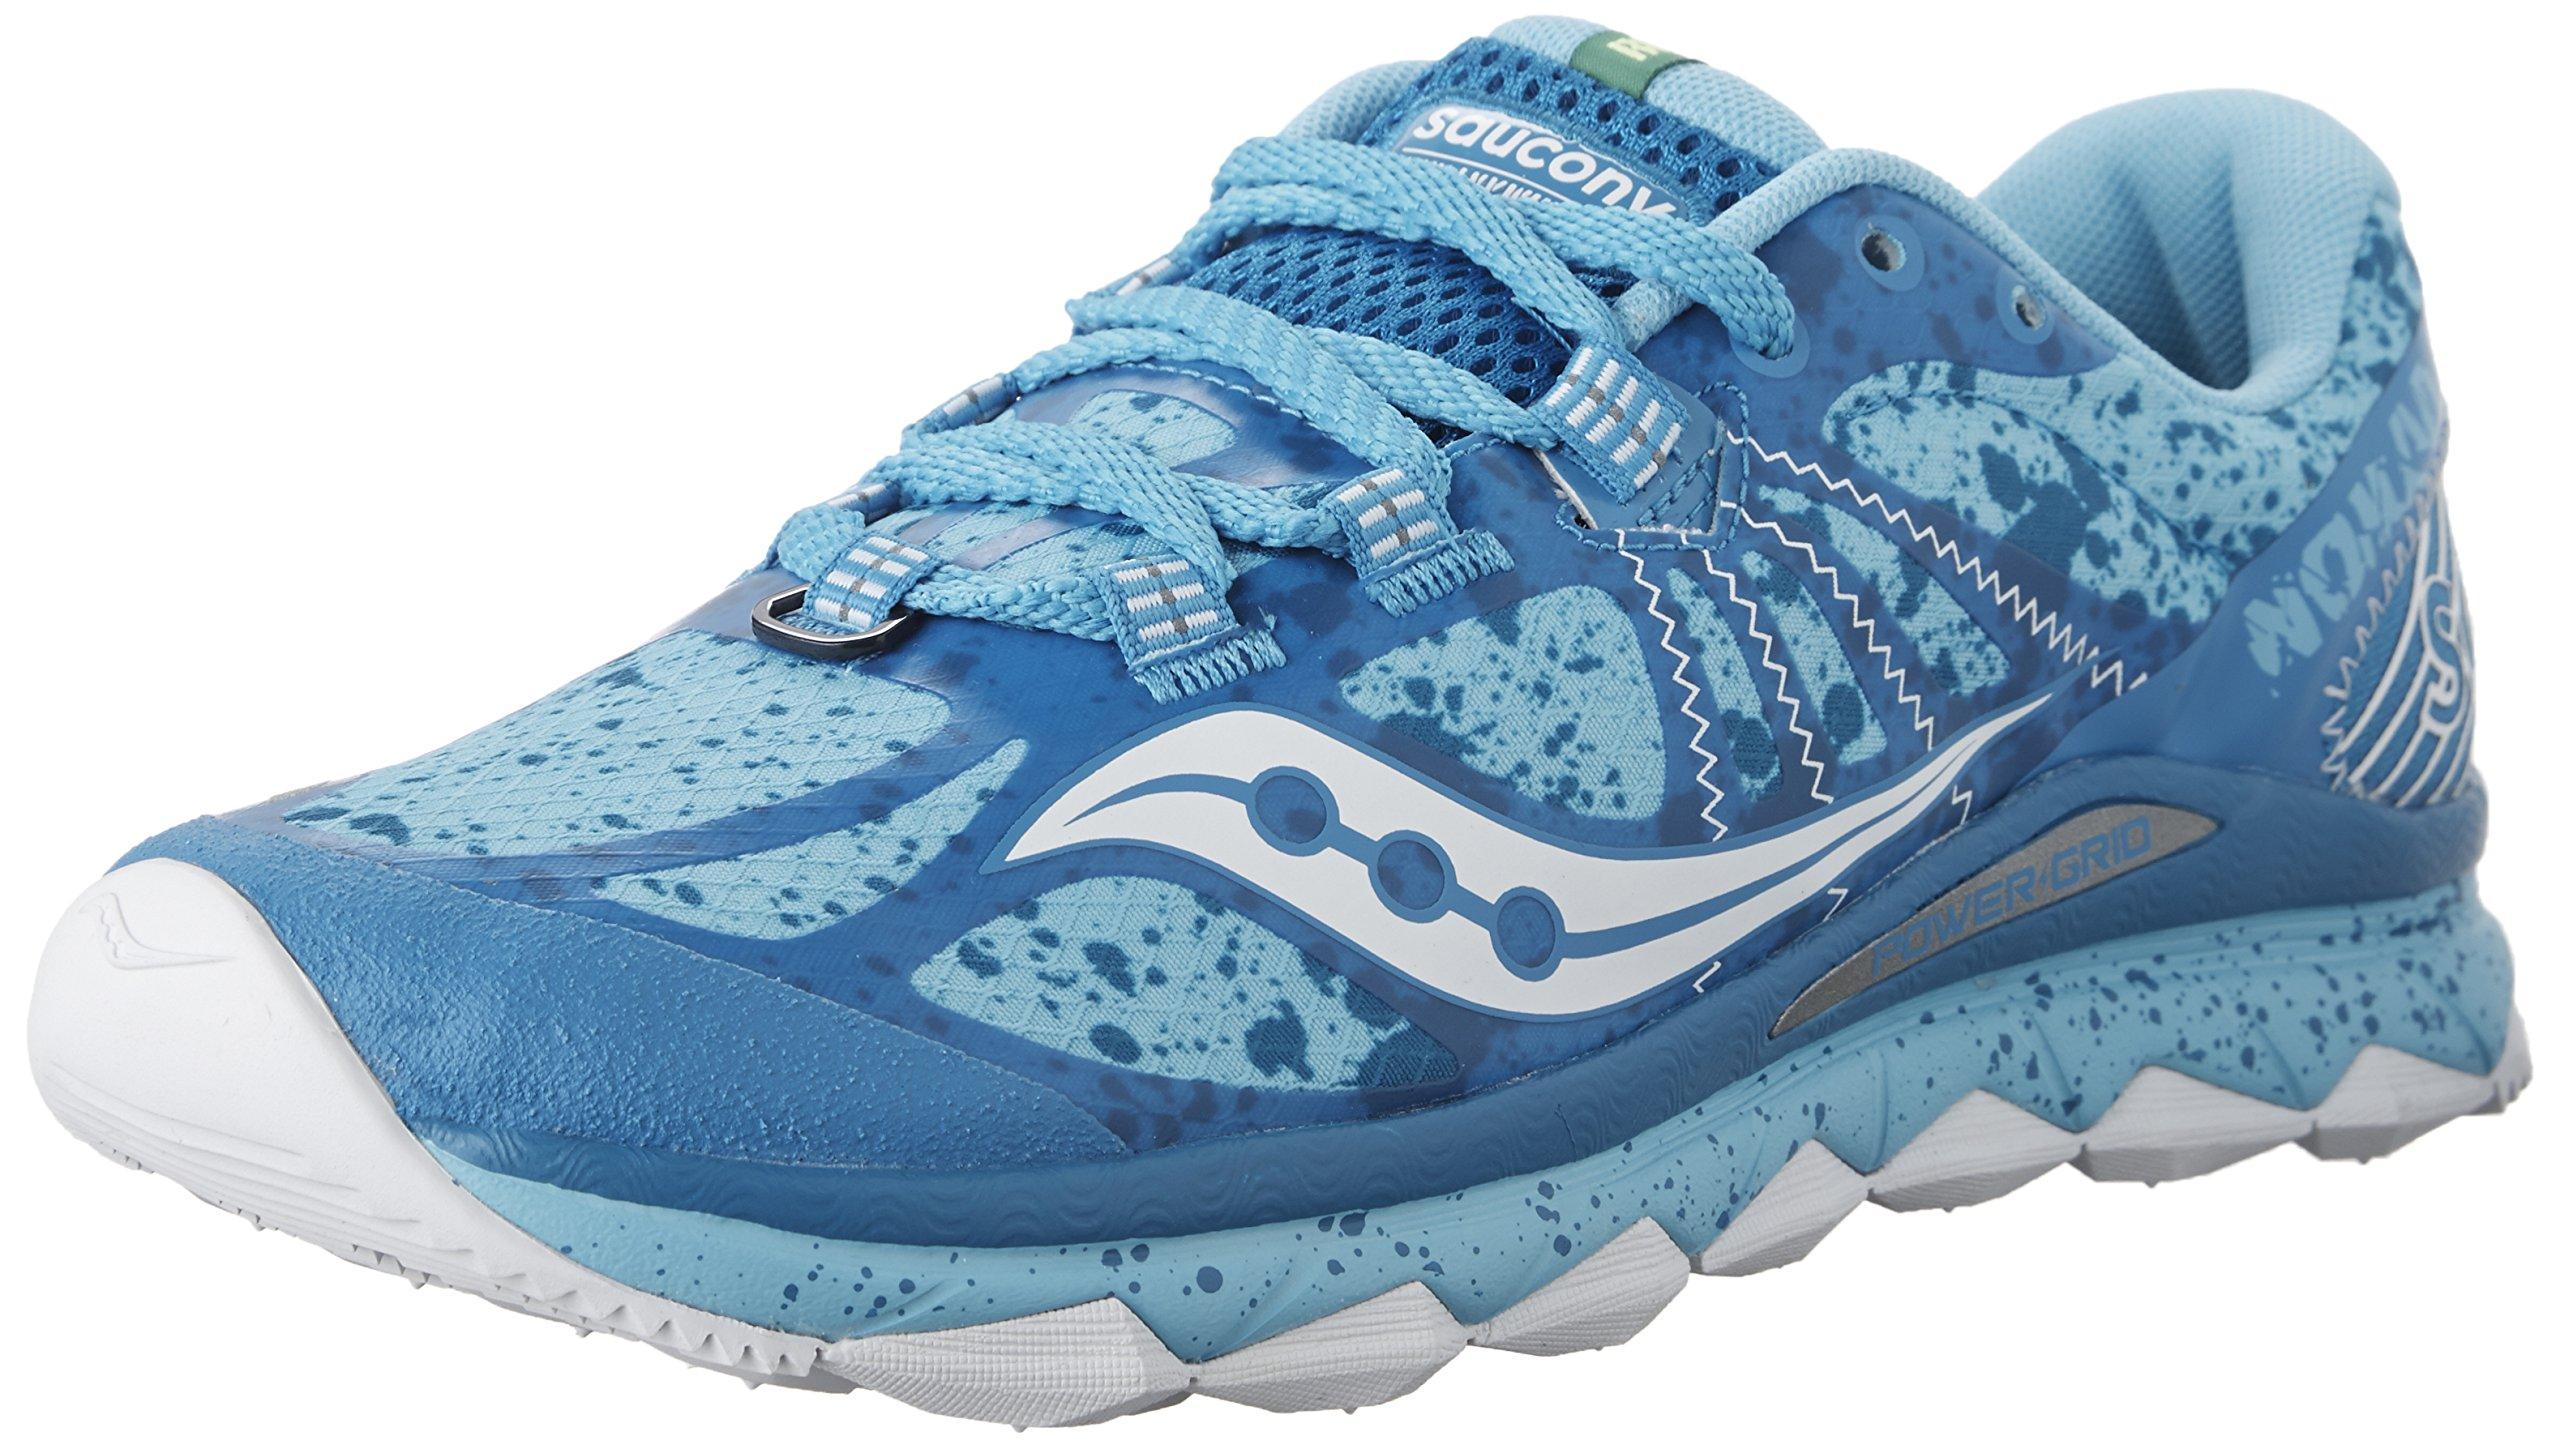 Saucony Women's Nomad TR Running Shoe,Blue/White,US 8.5 M